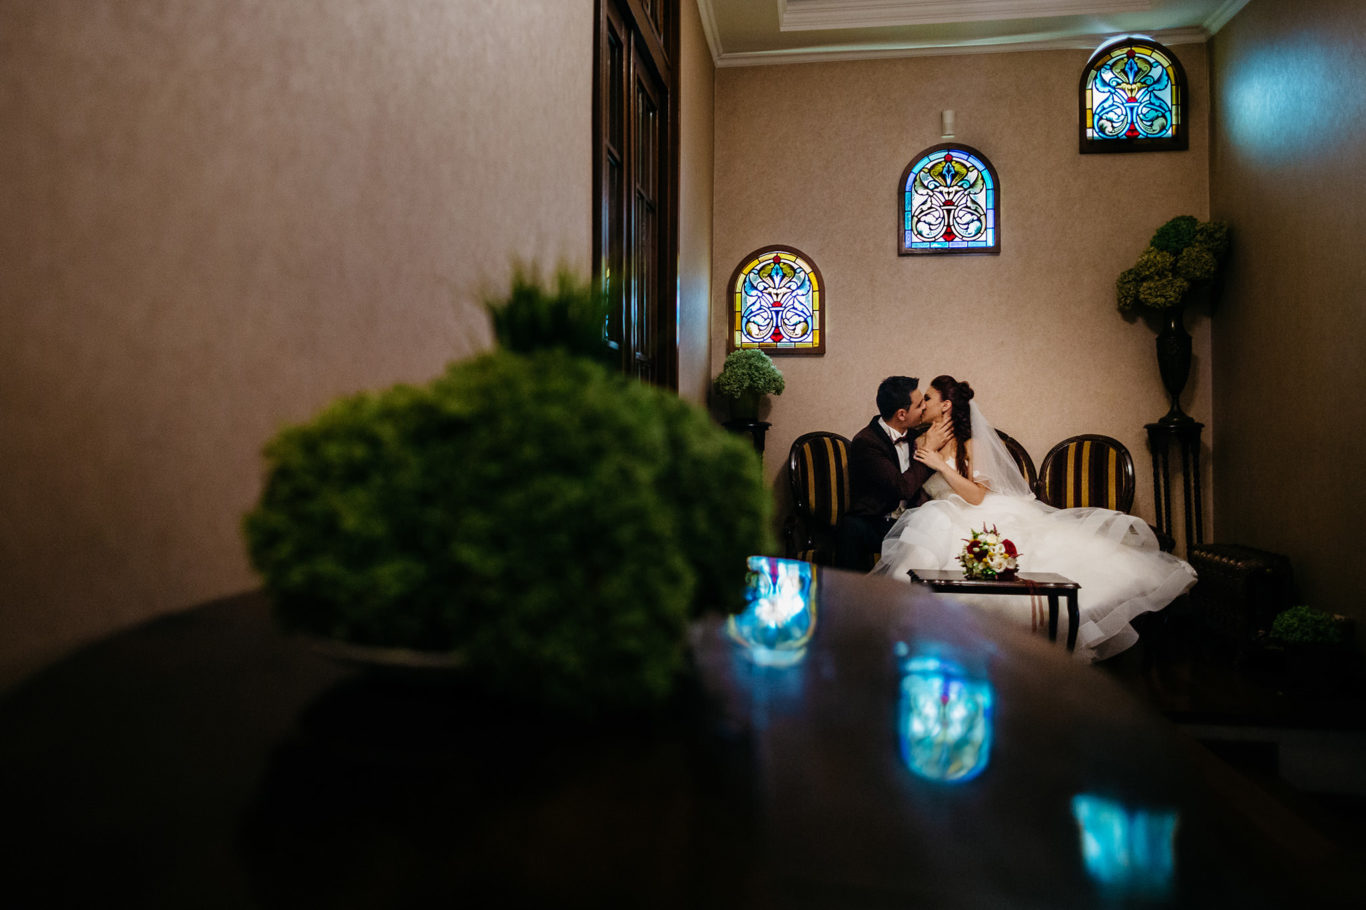 0243-fotografie-nunta-bucuresti-cristina-nicusor-fotograf-ciprian-dumitrescu-dc1_0161